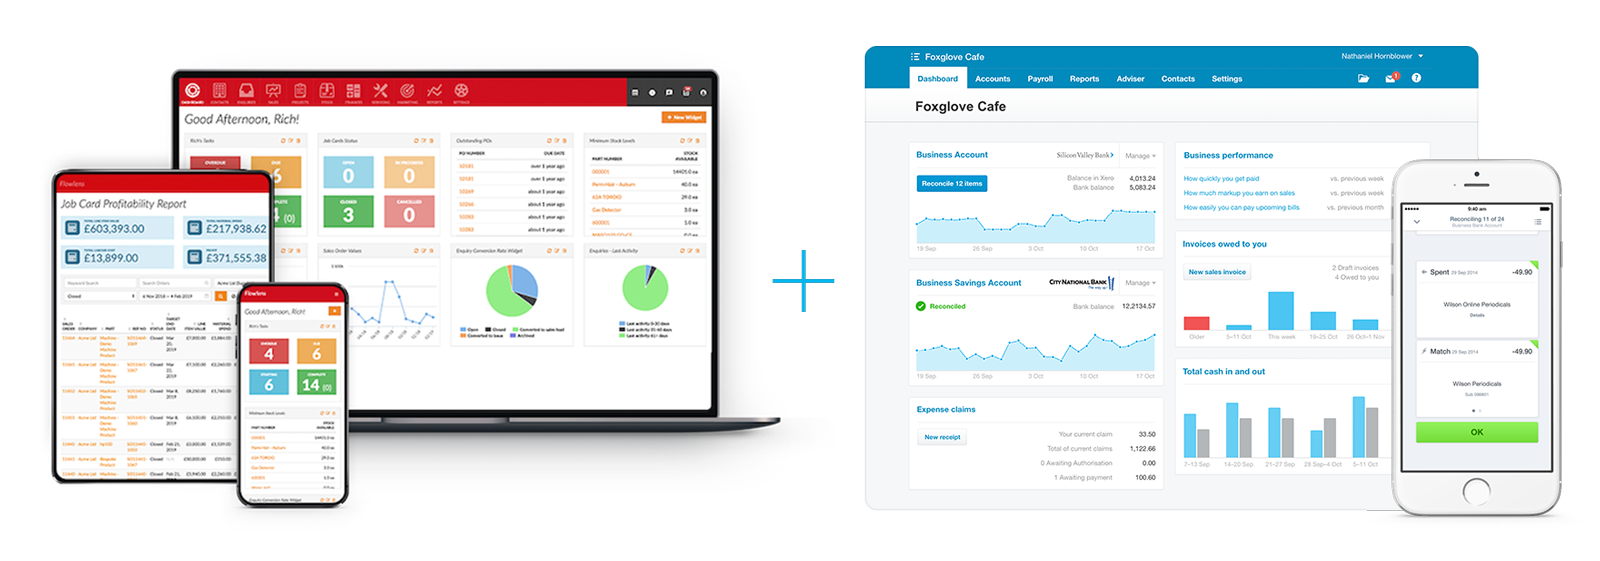 screenshots of Flowlens MRP software and Xero accounting software